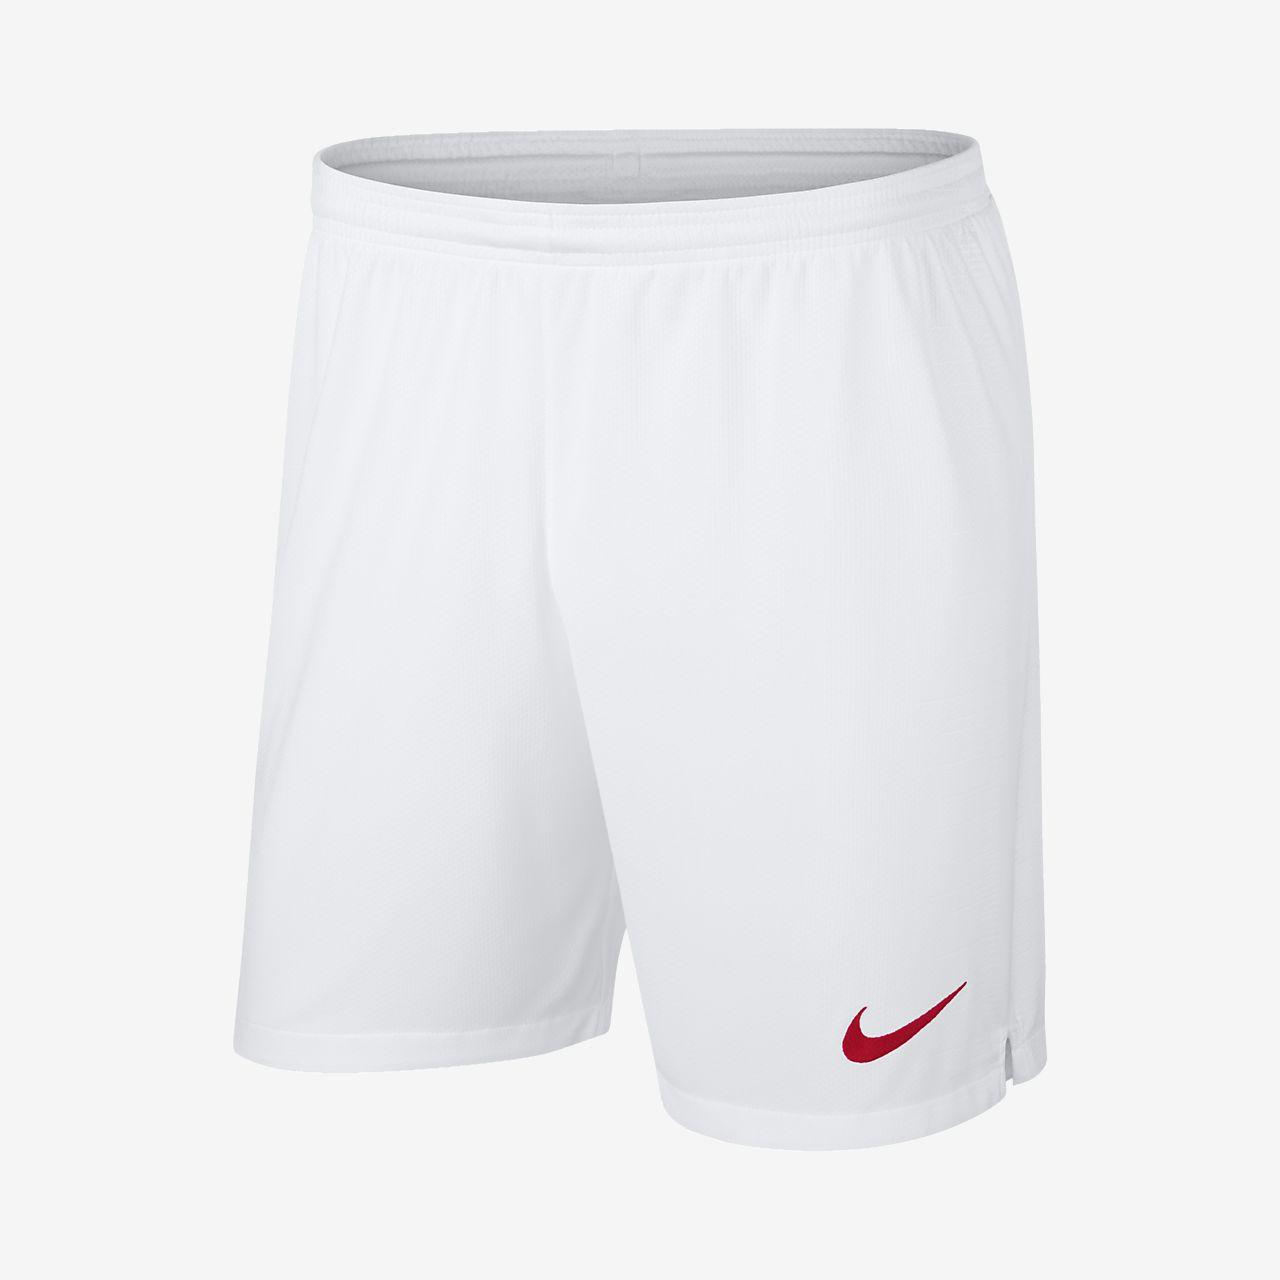 2018 Turkey Stadium Home/Away Men's Football Shorts